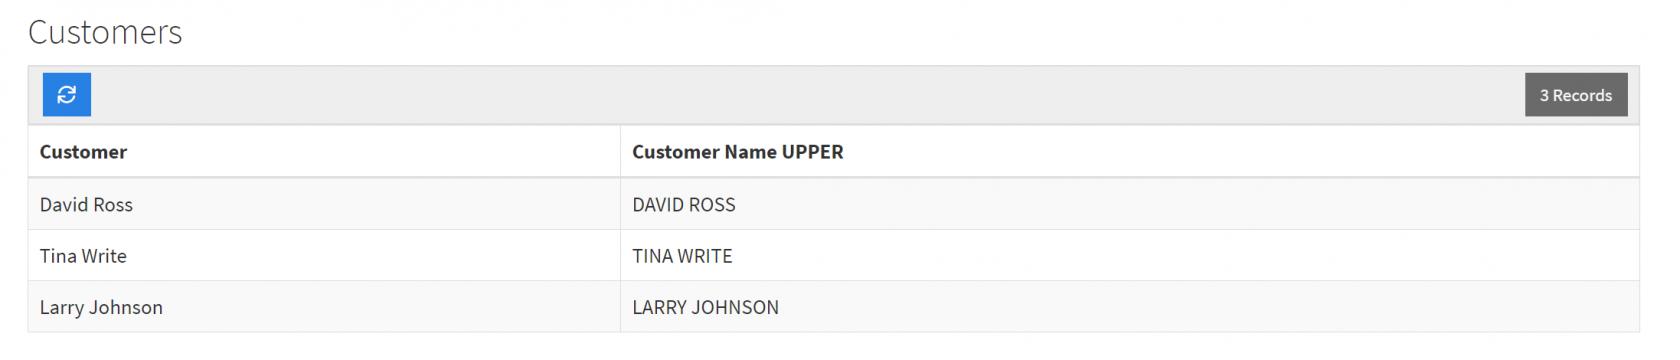 equation-customer-upper.png